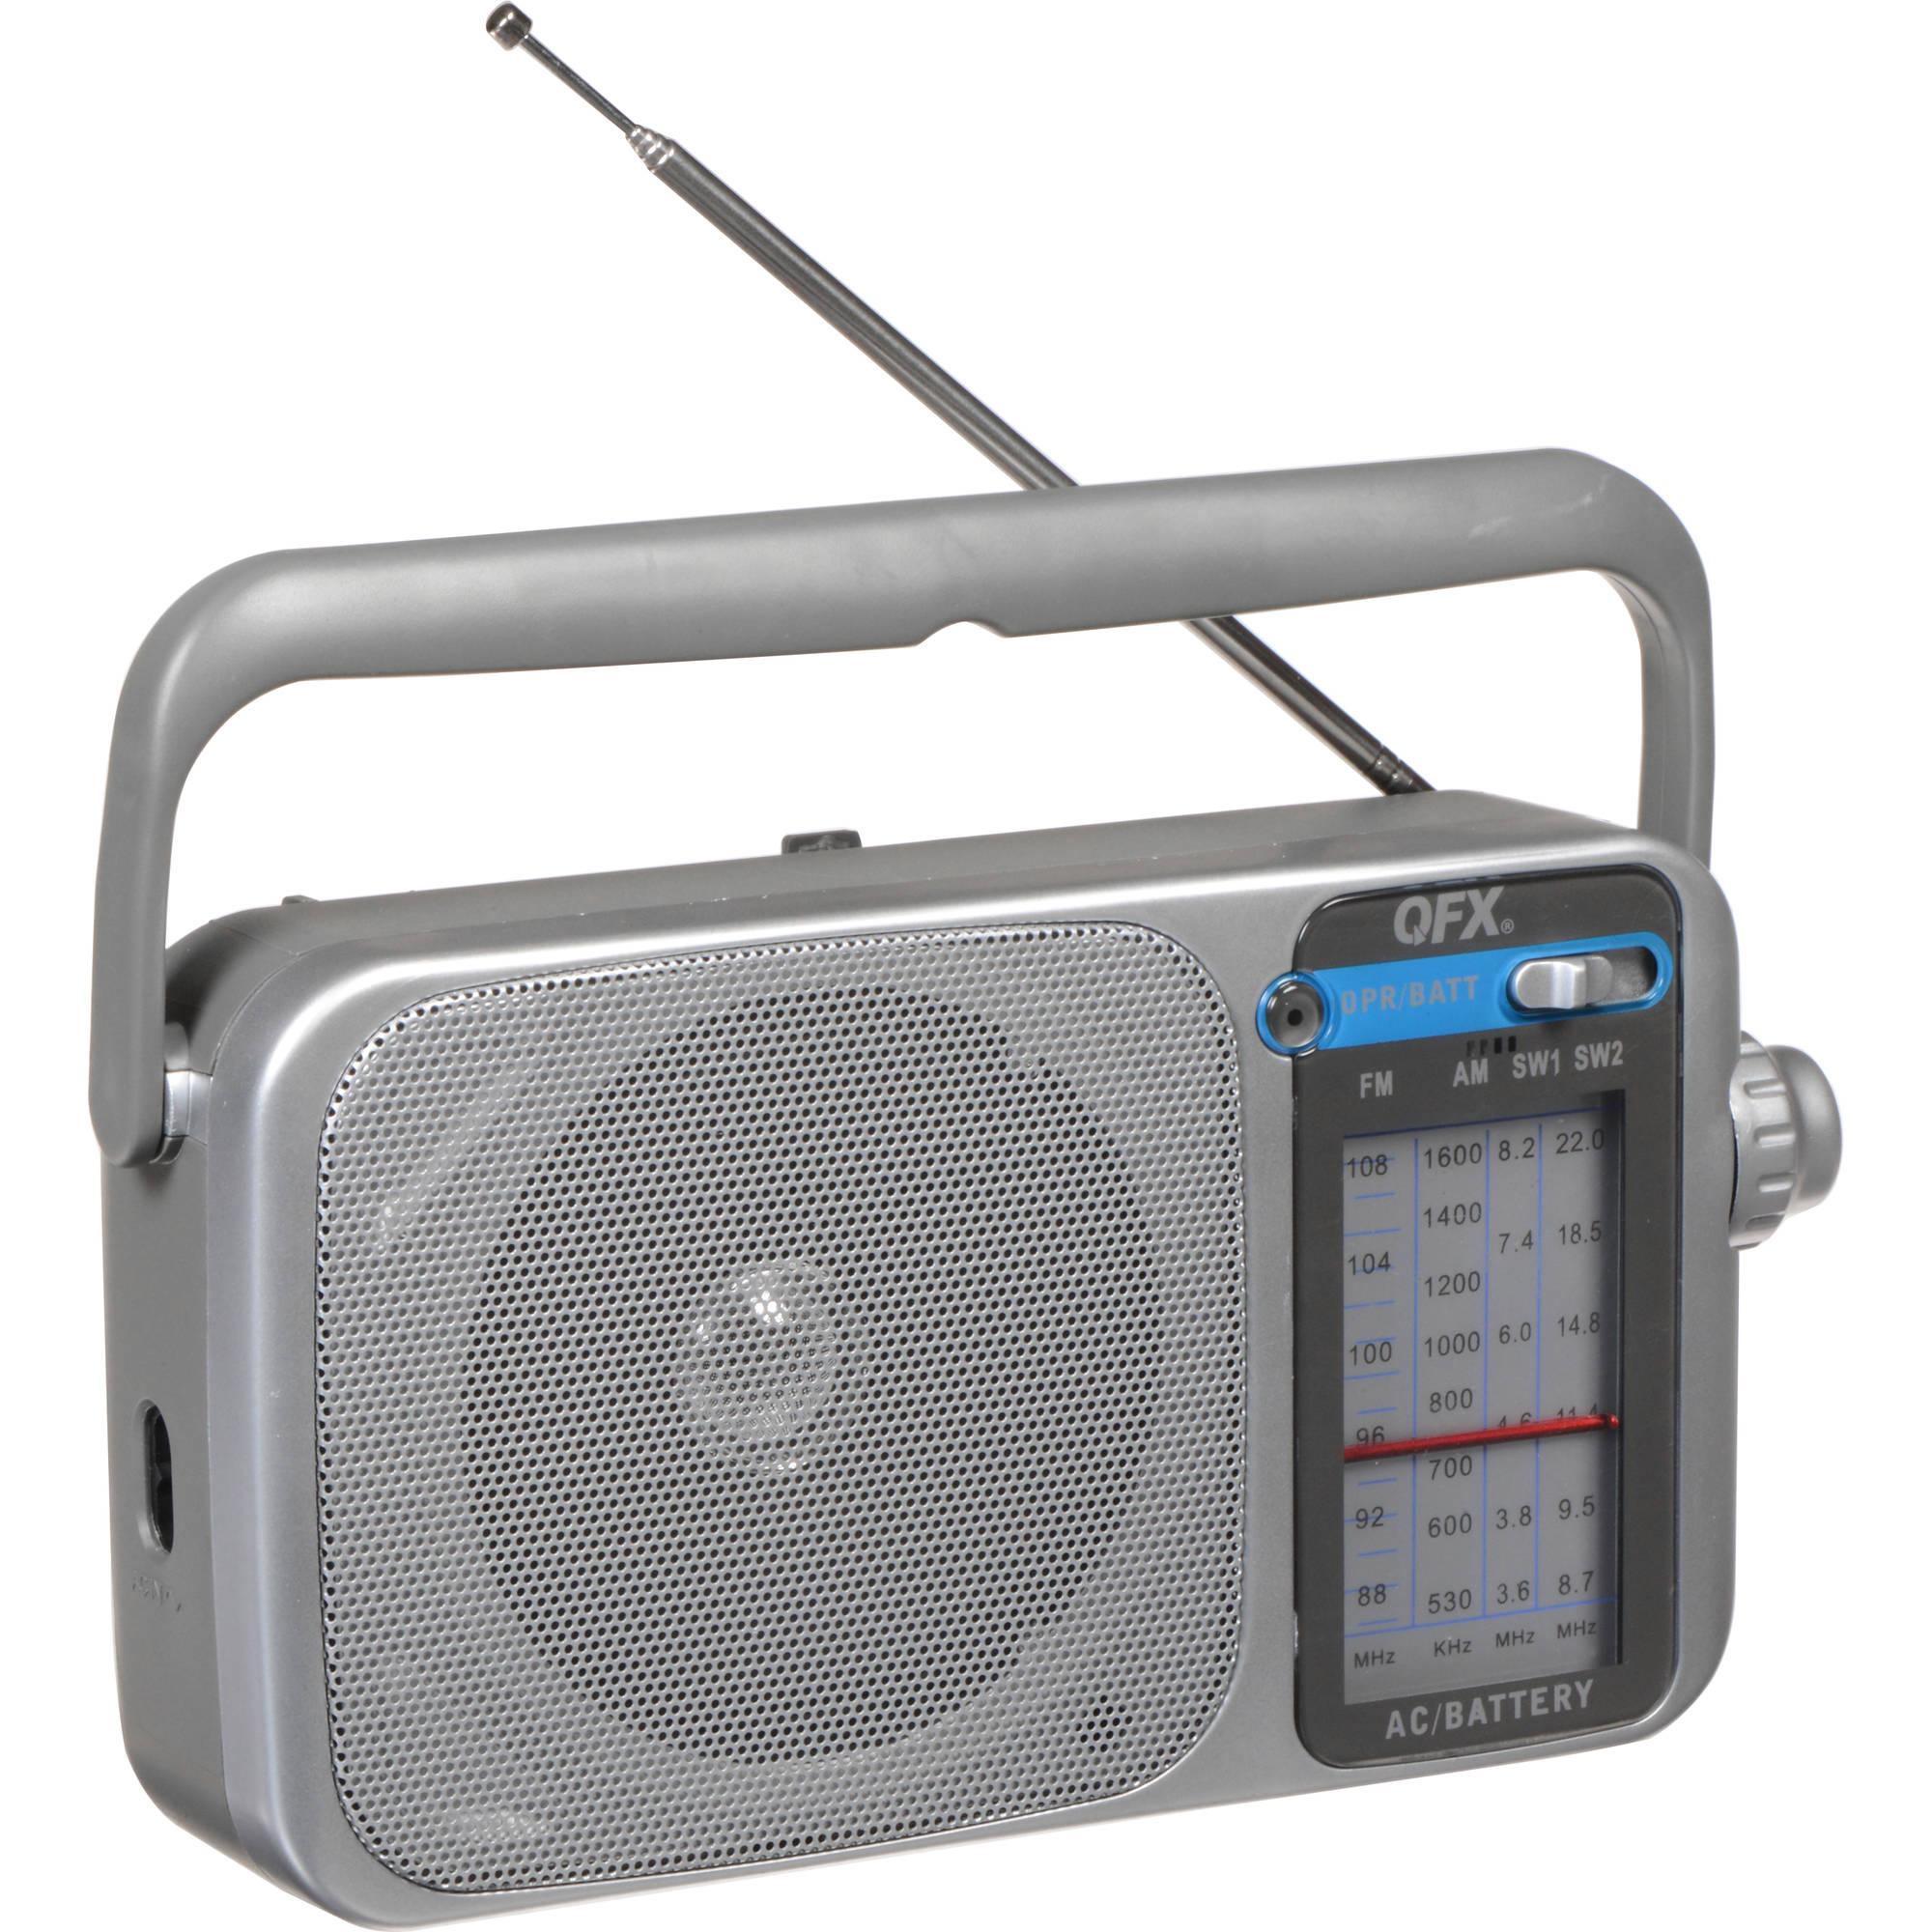 qfx r 24 portable am fm sw1 sw2 radio silver r 24 b h photo. Black Bedroom Furniture Sets. Home Design Ideas